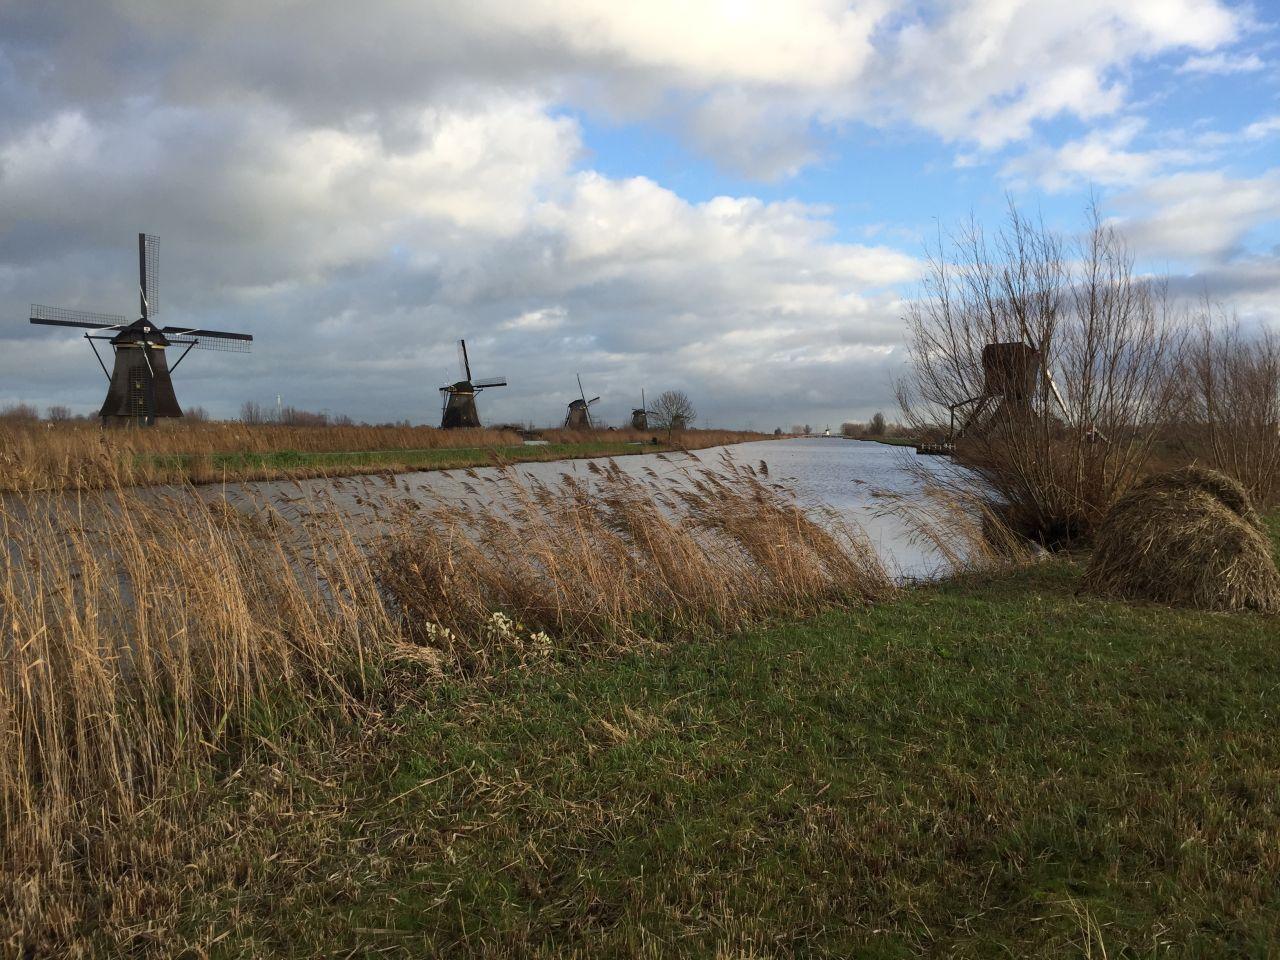 Blick auf die Muehlen des Overwaard am Kinderdijk in den Niederlanden